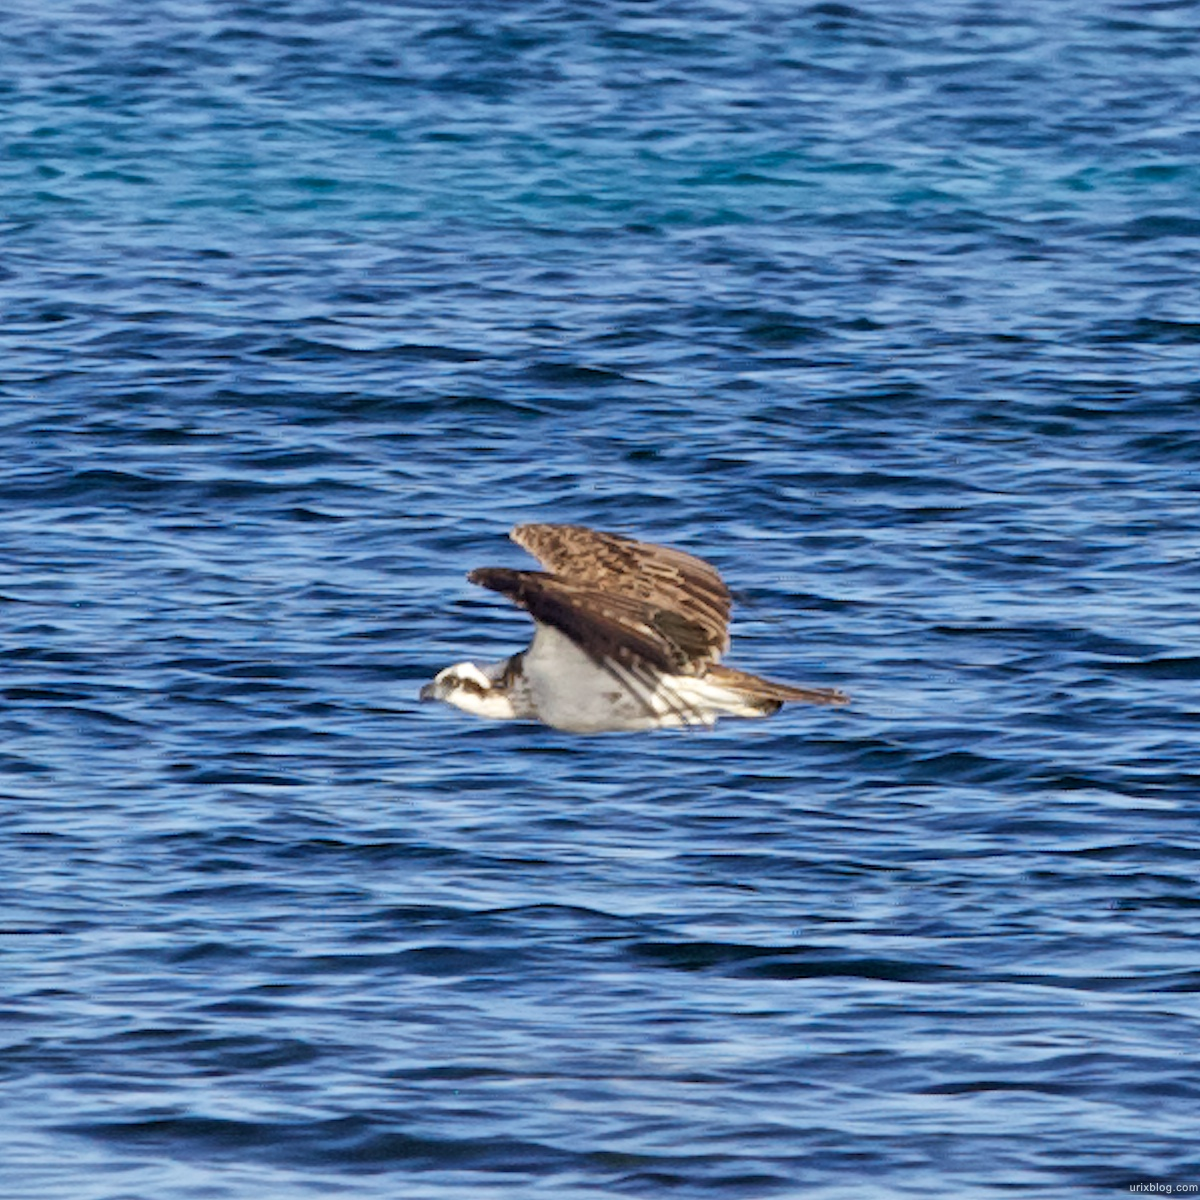 2011 2010 South Australia, Kangaroo Island, Остров Кенгуру, Южная Австралия, Vivonne Bay, bird, птичка